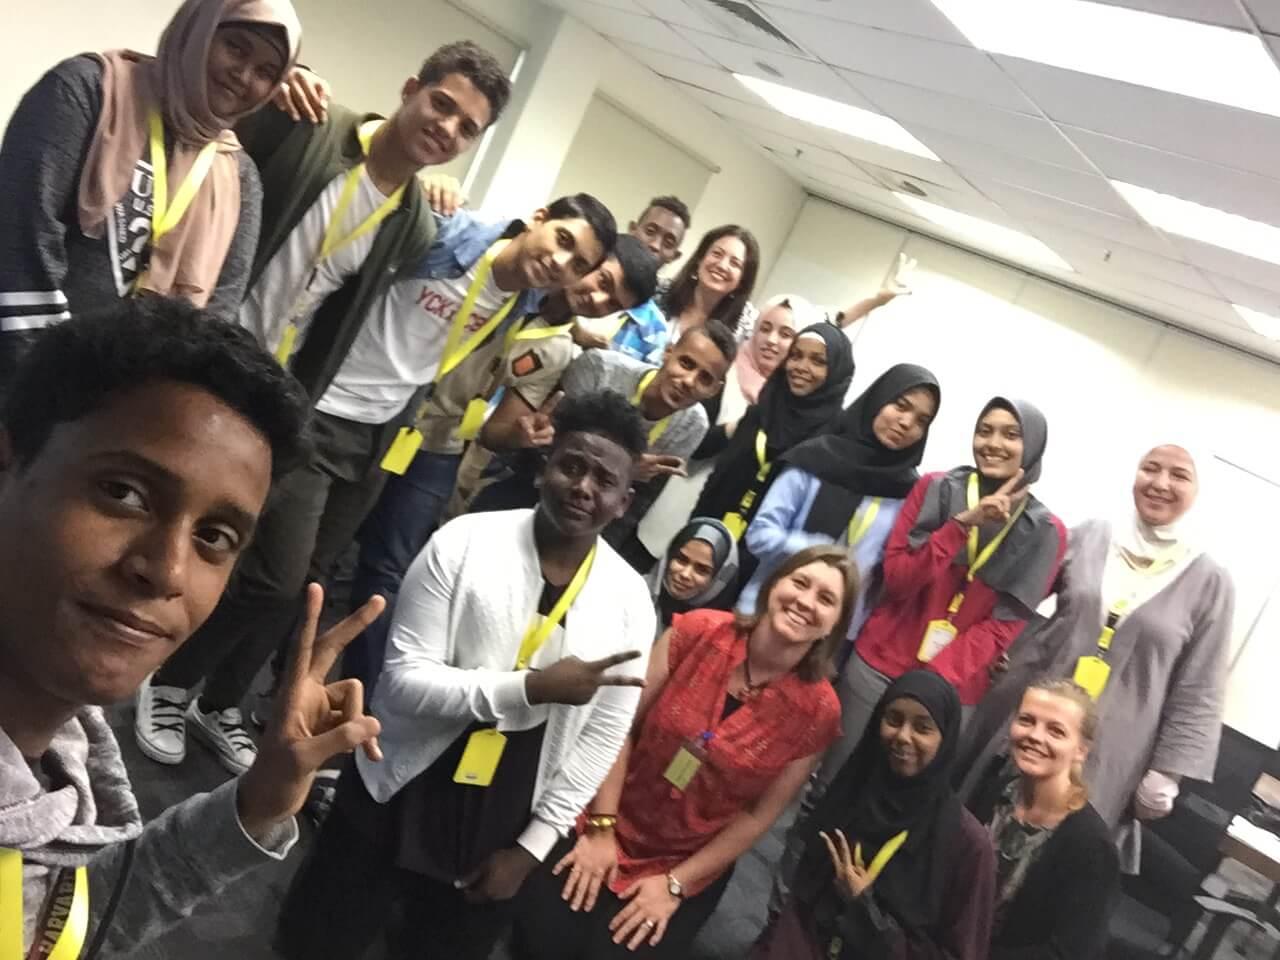 Second cohort of CERTE Bridge course took off at Monash University, Malaysia on 4th October 2017